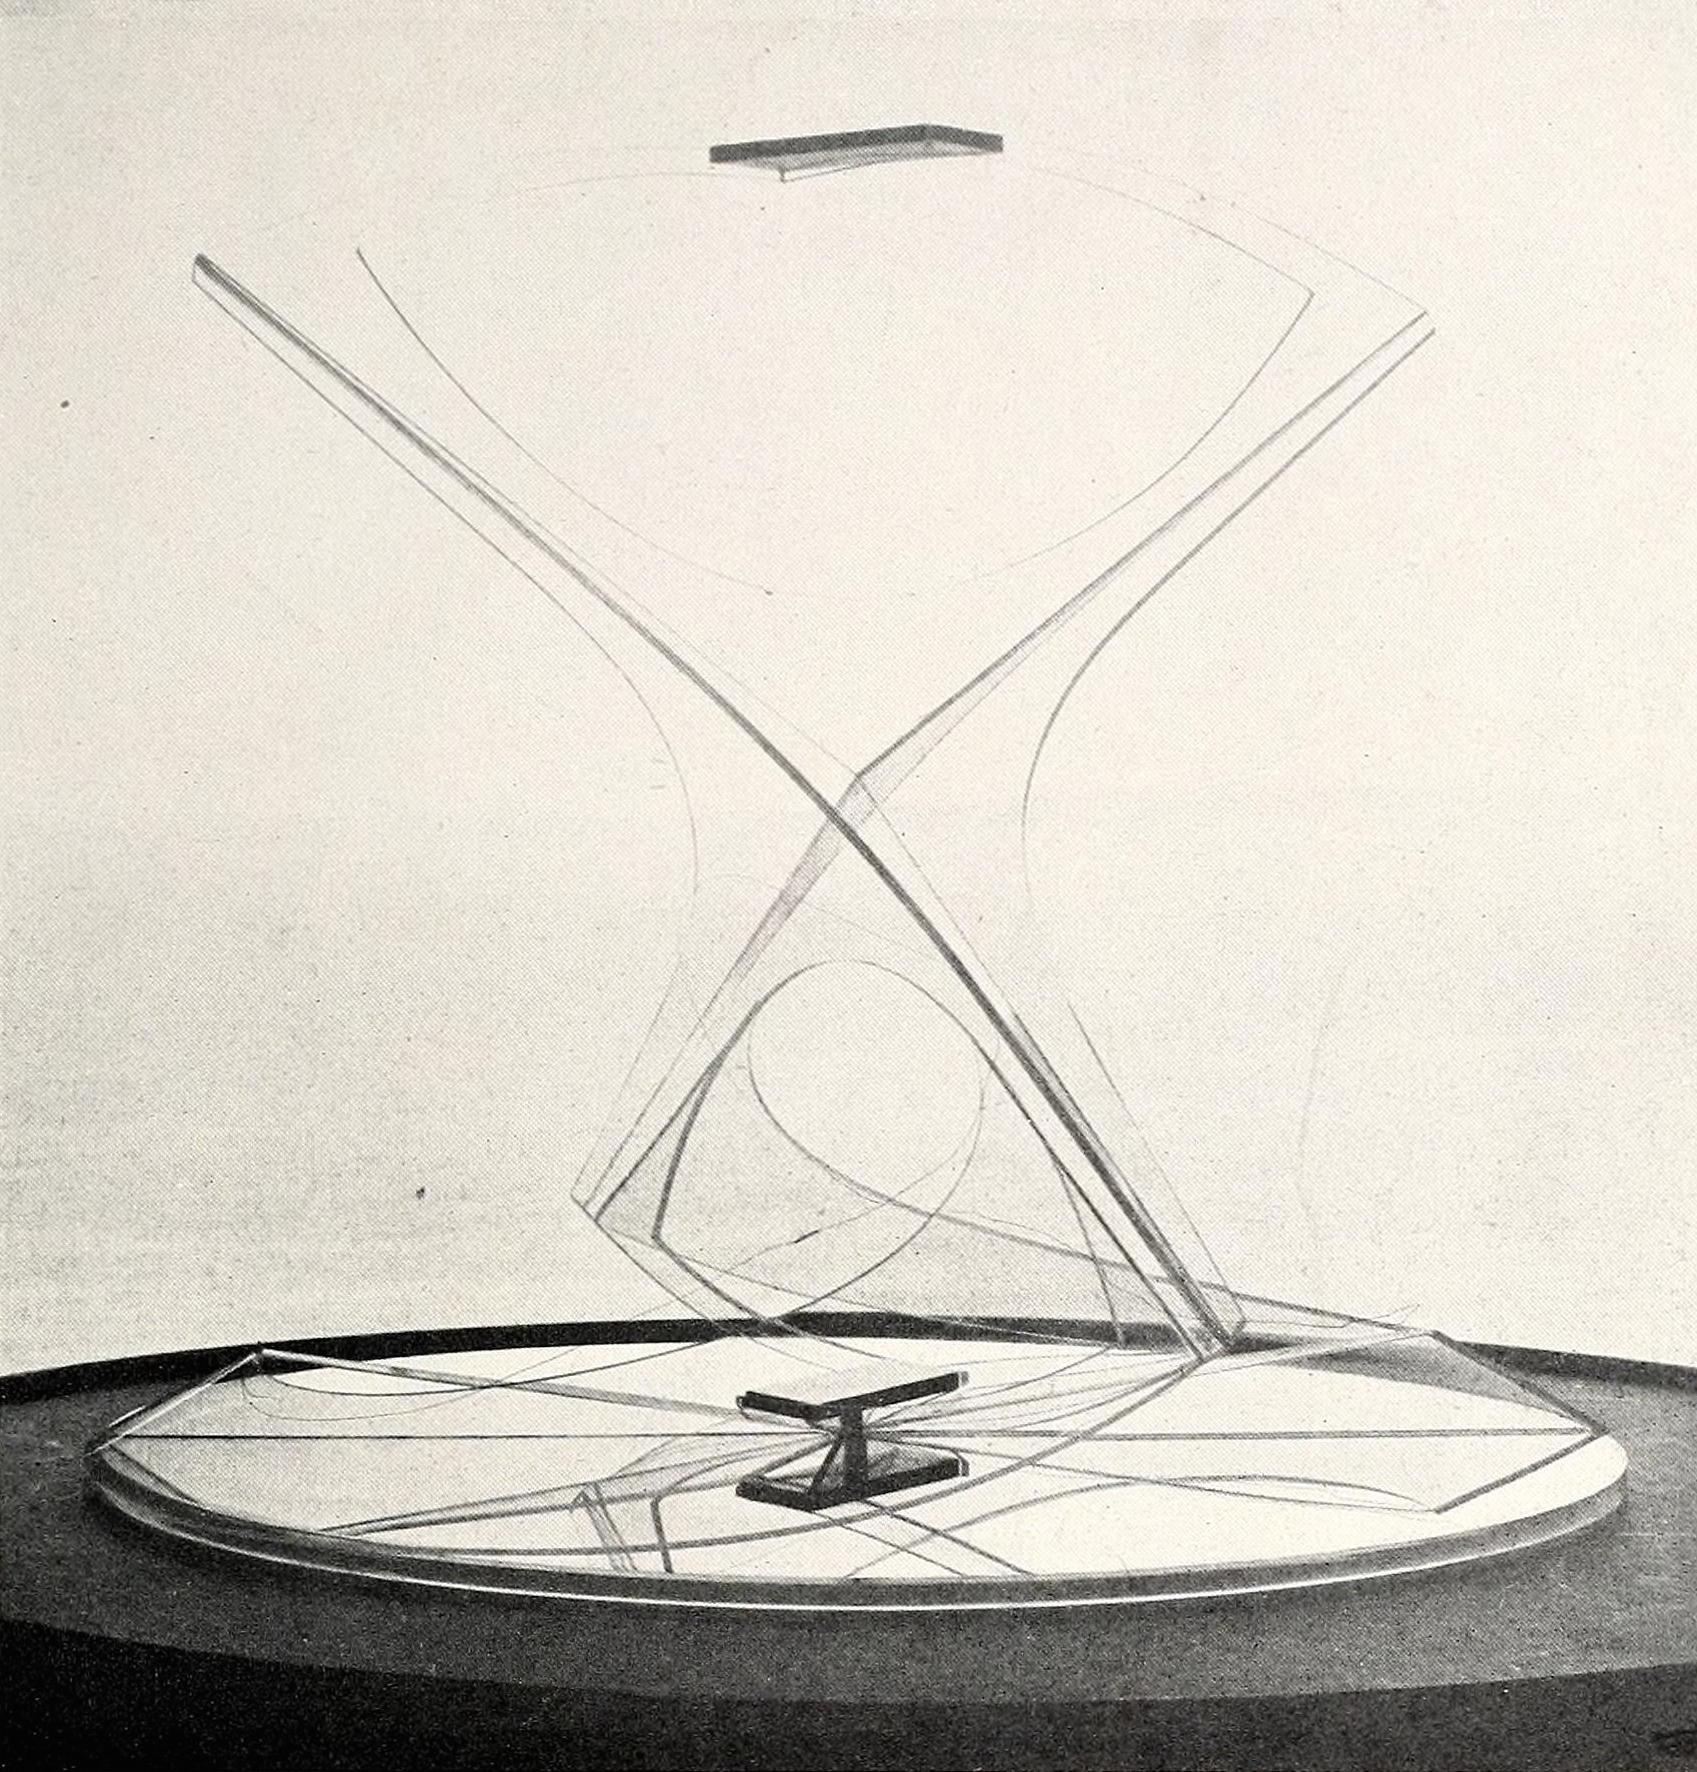 Naum Gabo, Torsion (1928-1936), Plastic 13,75 inches high